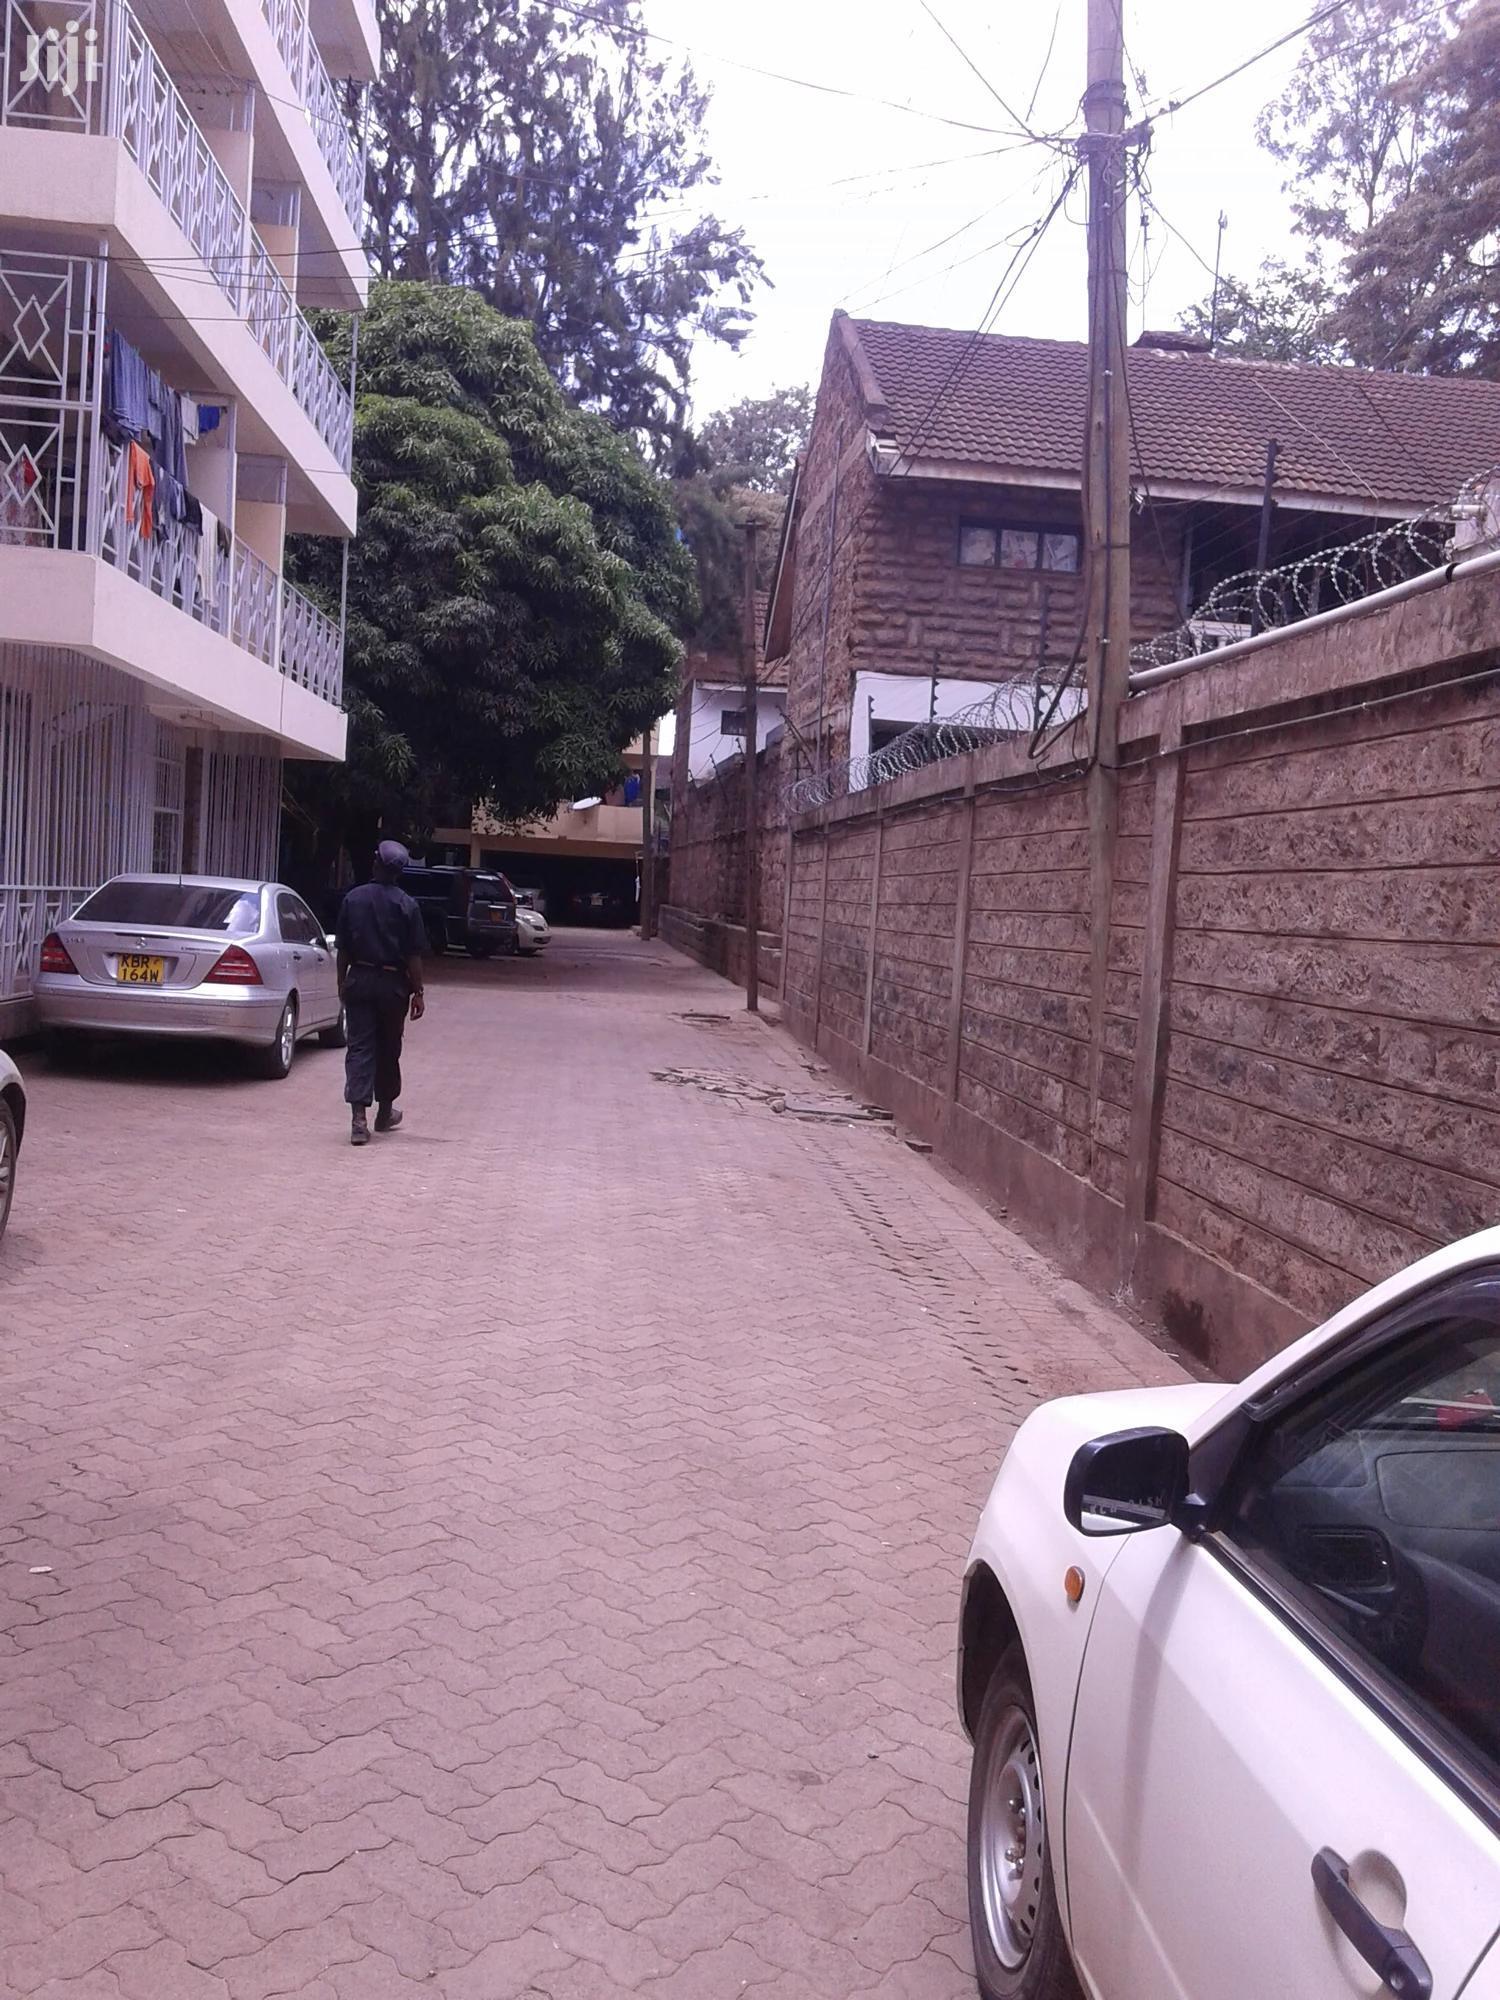 Nairobi West 2 Bedroom Flat For Rent In Nairobi West Houses Apartments For Rent Nationwide Properties Jiji Co Ke